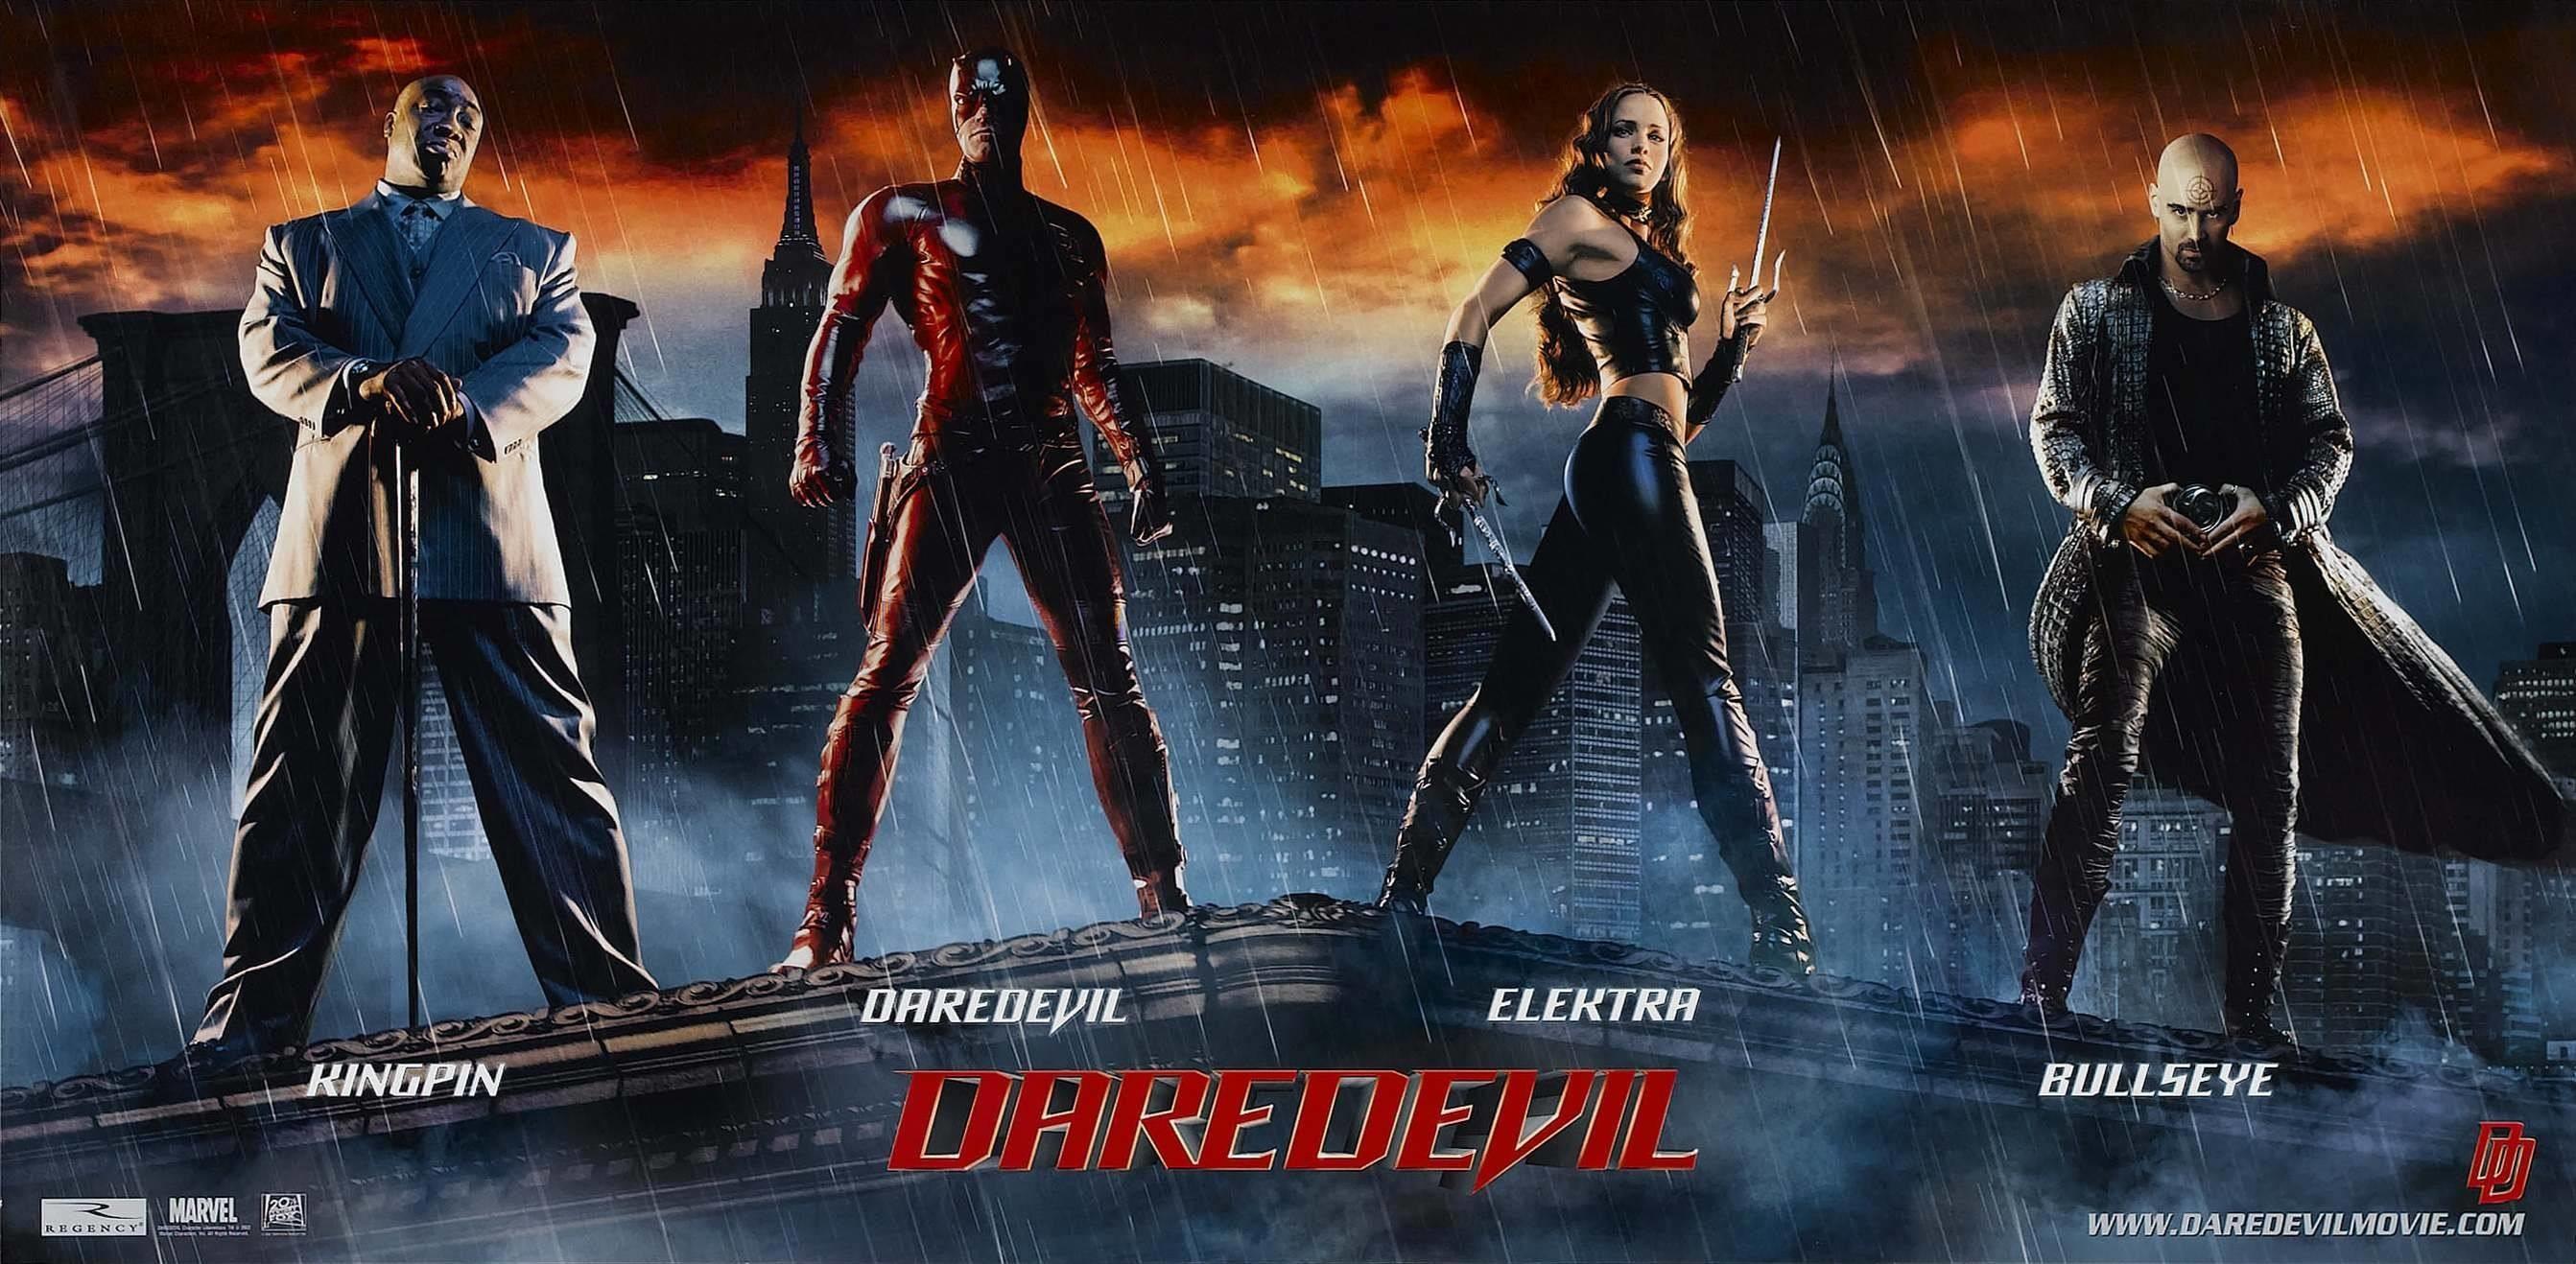 Daredevil (Wallpaper), Wallpaper for